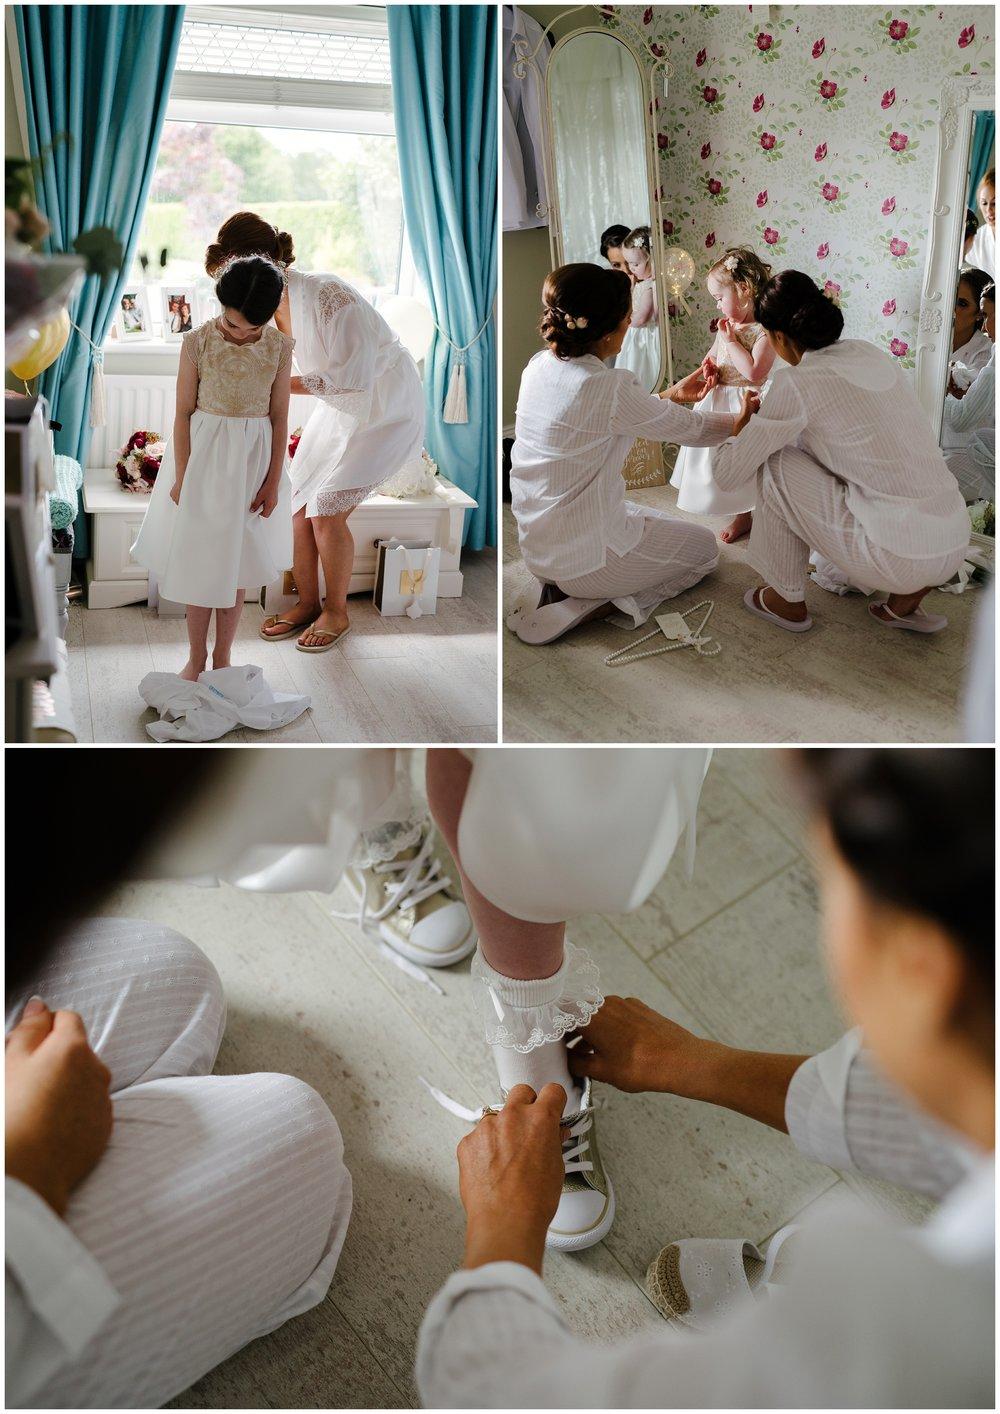 sinead_emmet_farnham_estate_wedding_jude_browne_photography_0031.jpg